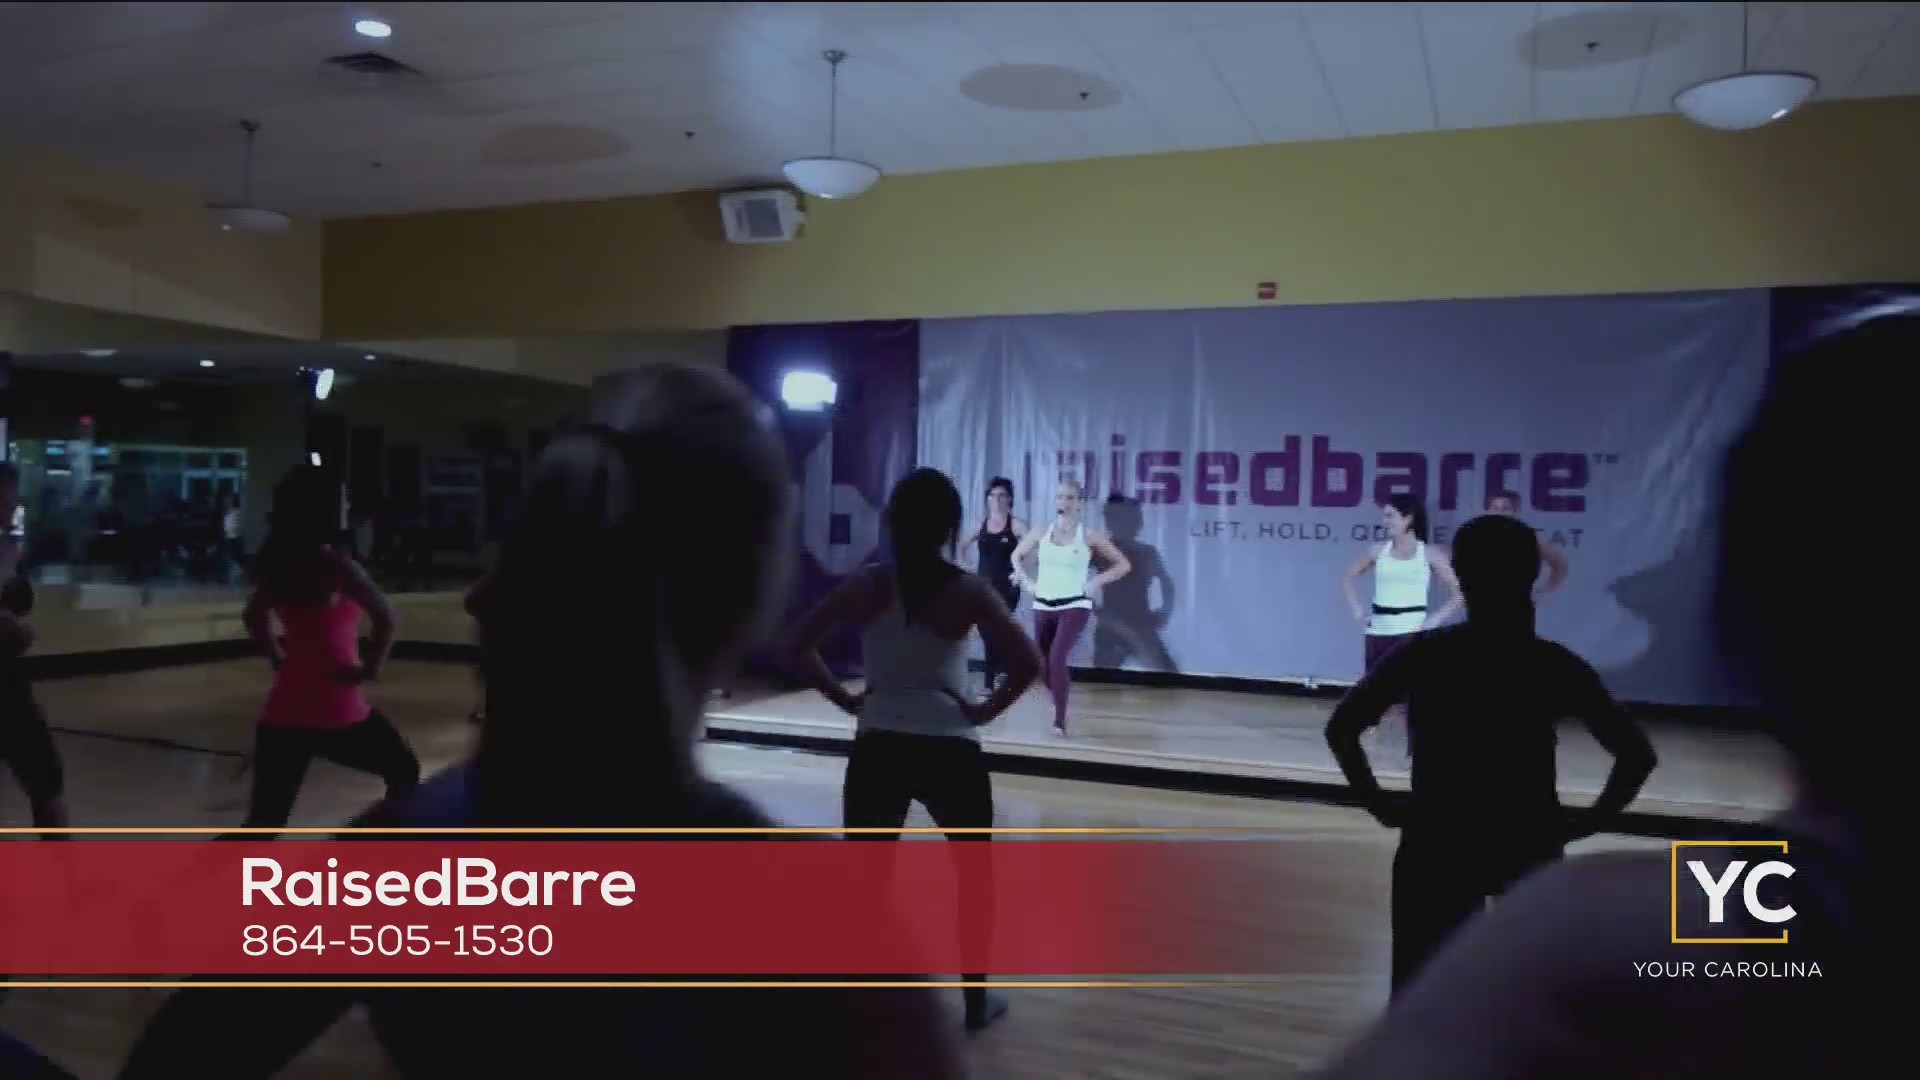 Work it Monday - RaisedBarre